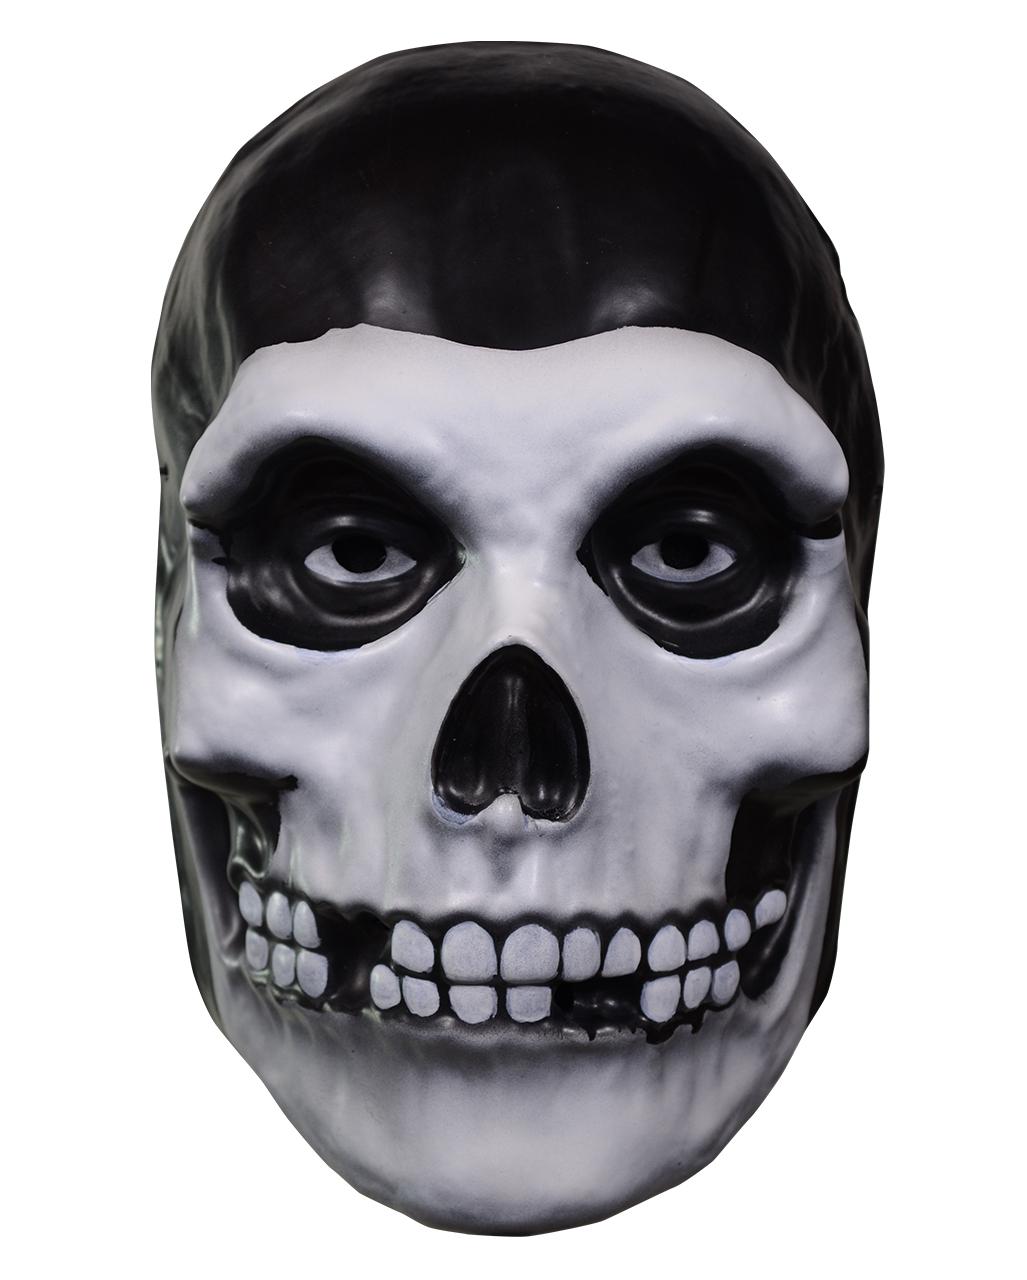 Misfits - The Fiend Half Mask for Halloween   horror-shop.com